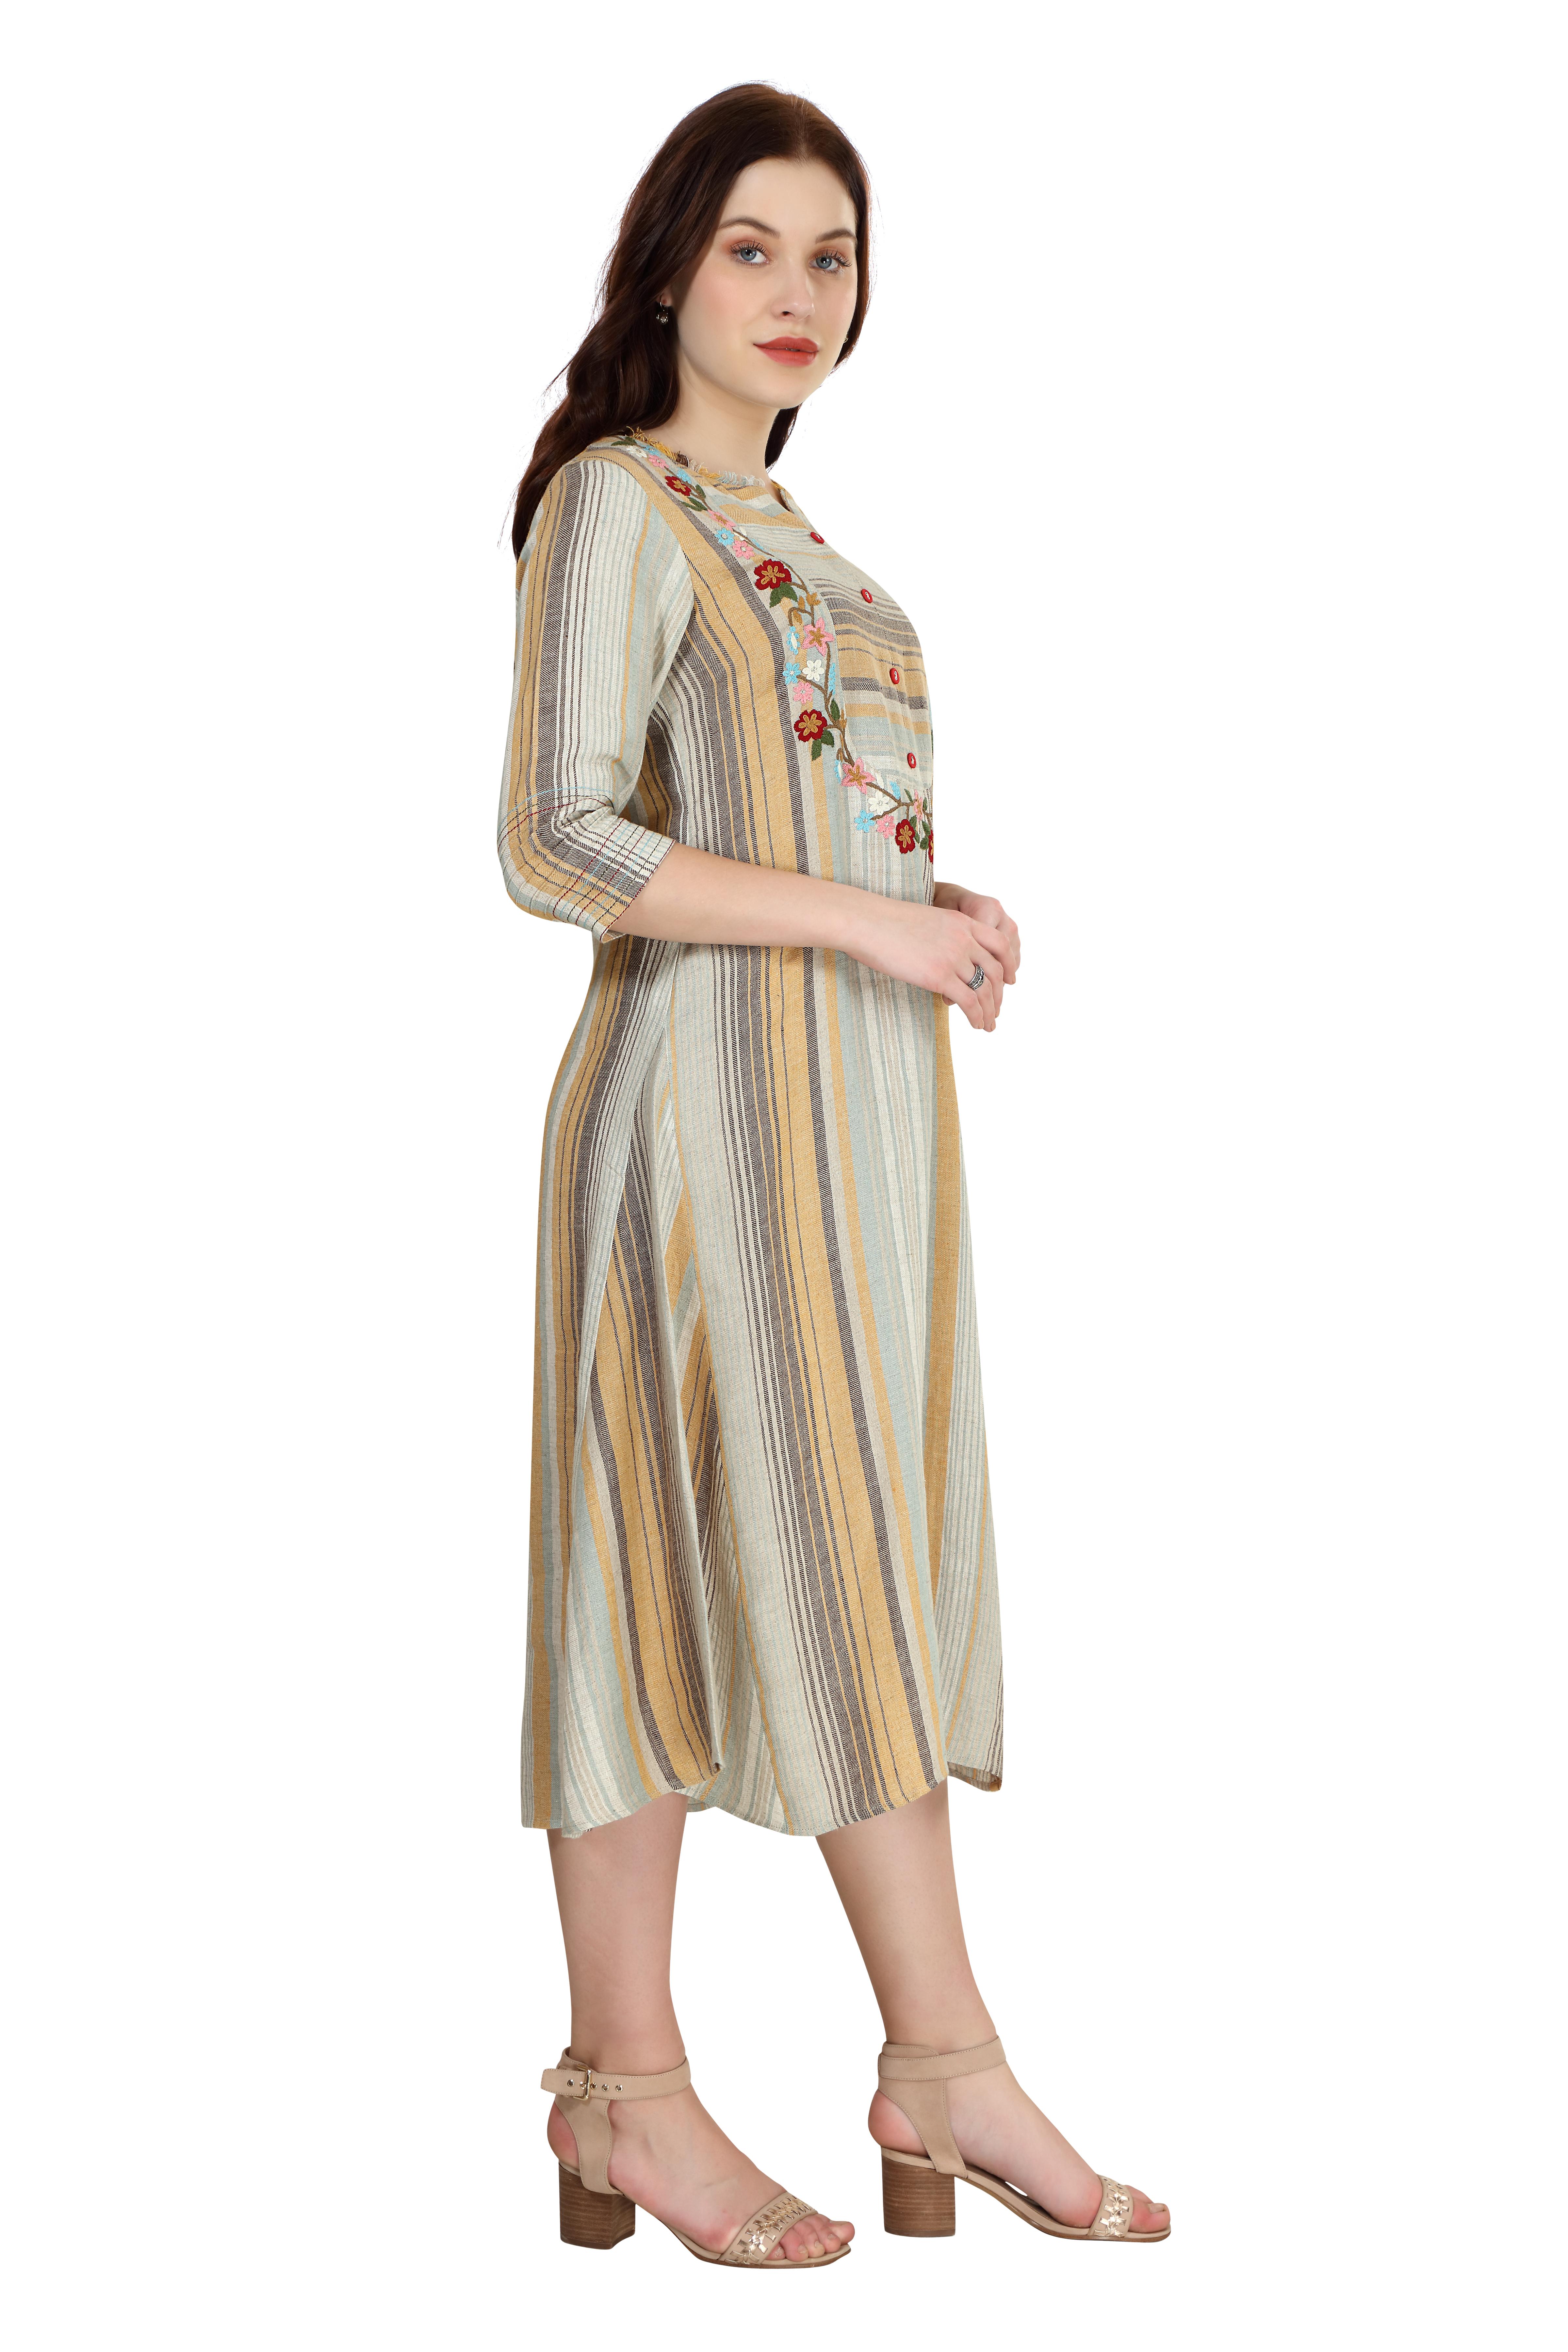 202027 Mustard Engineered Stripe Yolk Embroidered Linen Dress XS - Mustard (L,Mustard)